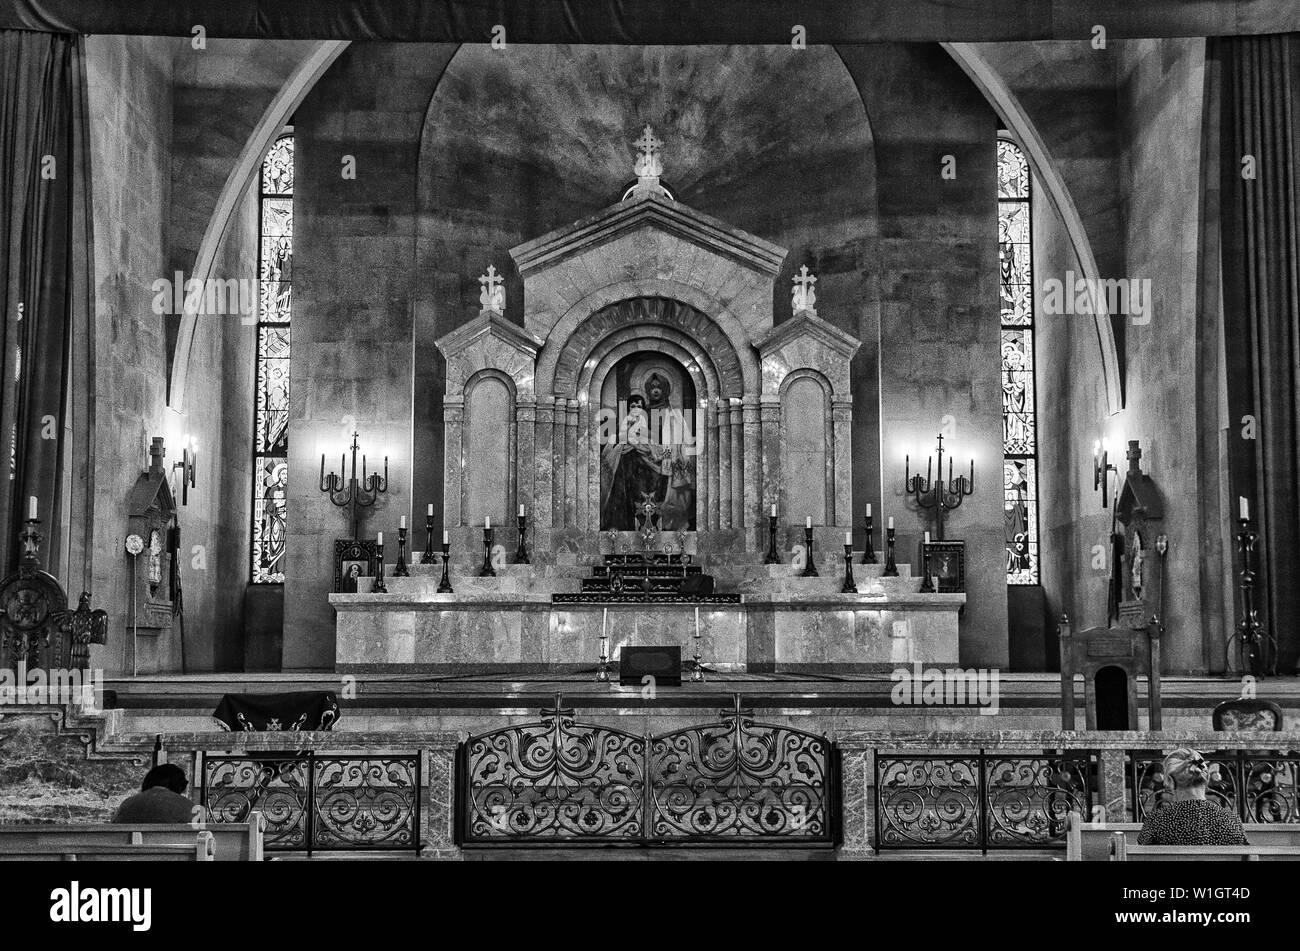 An interior of an old Armenian Christian church - Stock Image